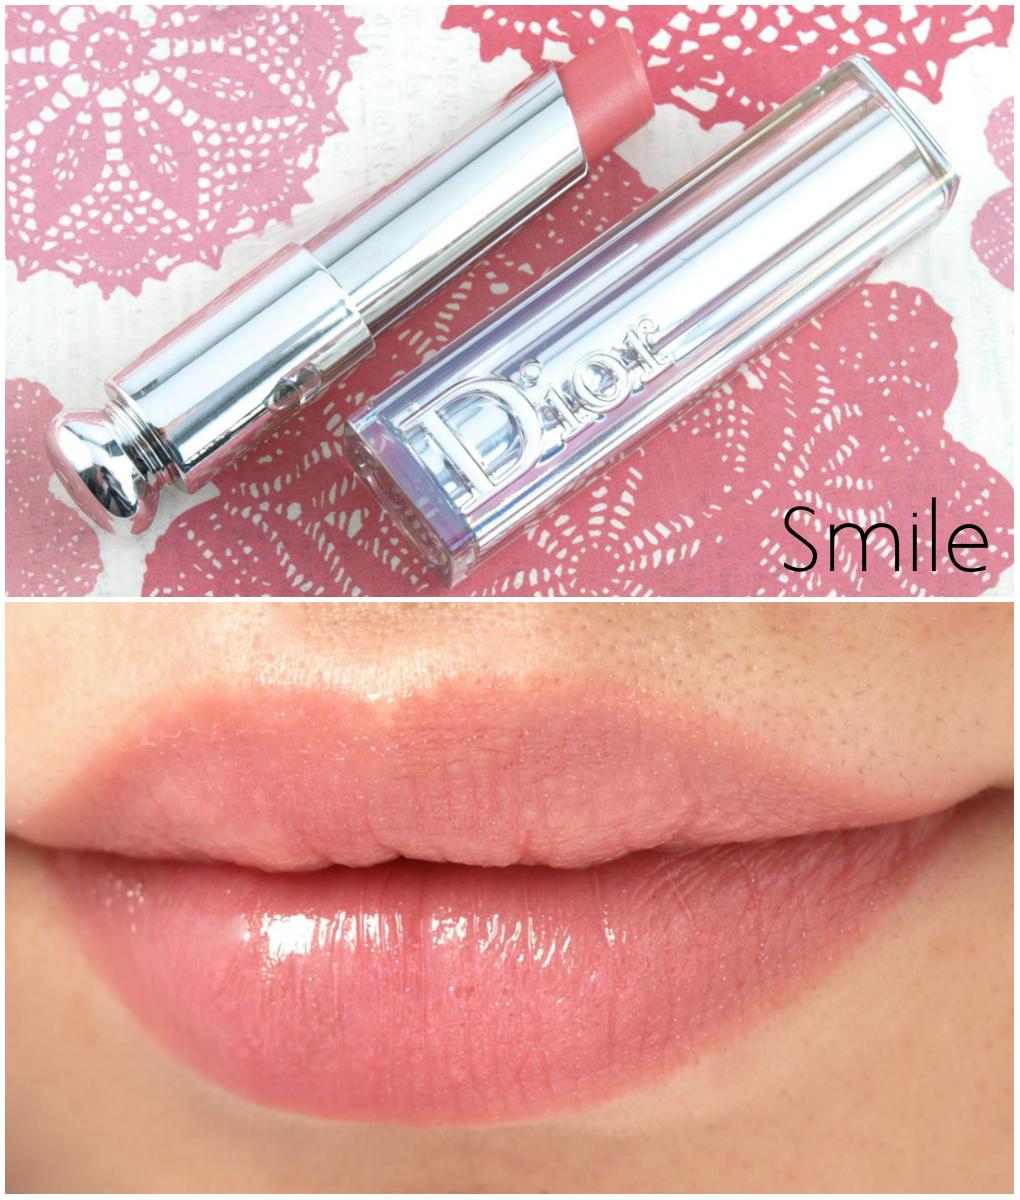 "NEW Dior Addict Lipstick Collection 2015 in ""Smile ..."